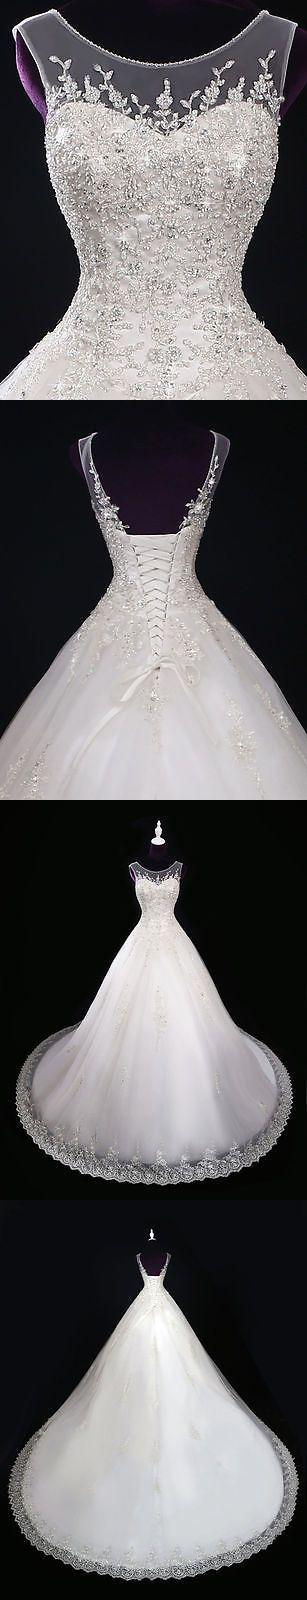 Wedding Dresses: New Lace Ivory/White Wedding Dress Bridal Gown Custom Size 2 4 6 8 10 12 14 16+ -> BUY IT NOW ONLY: $130.0 on eBay!